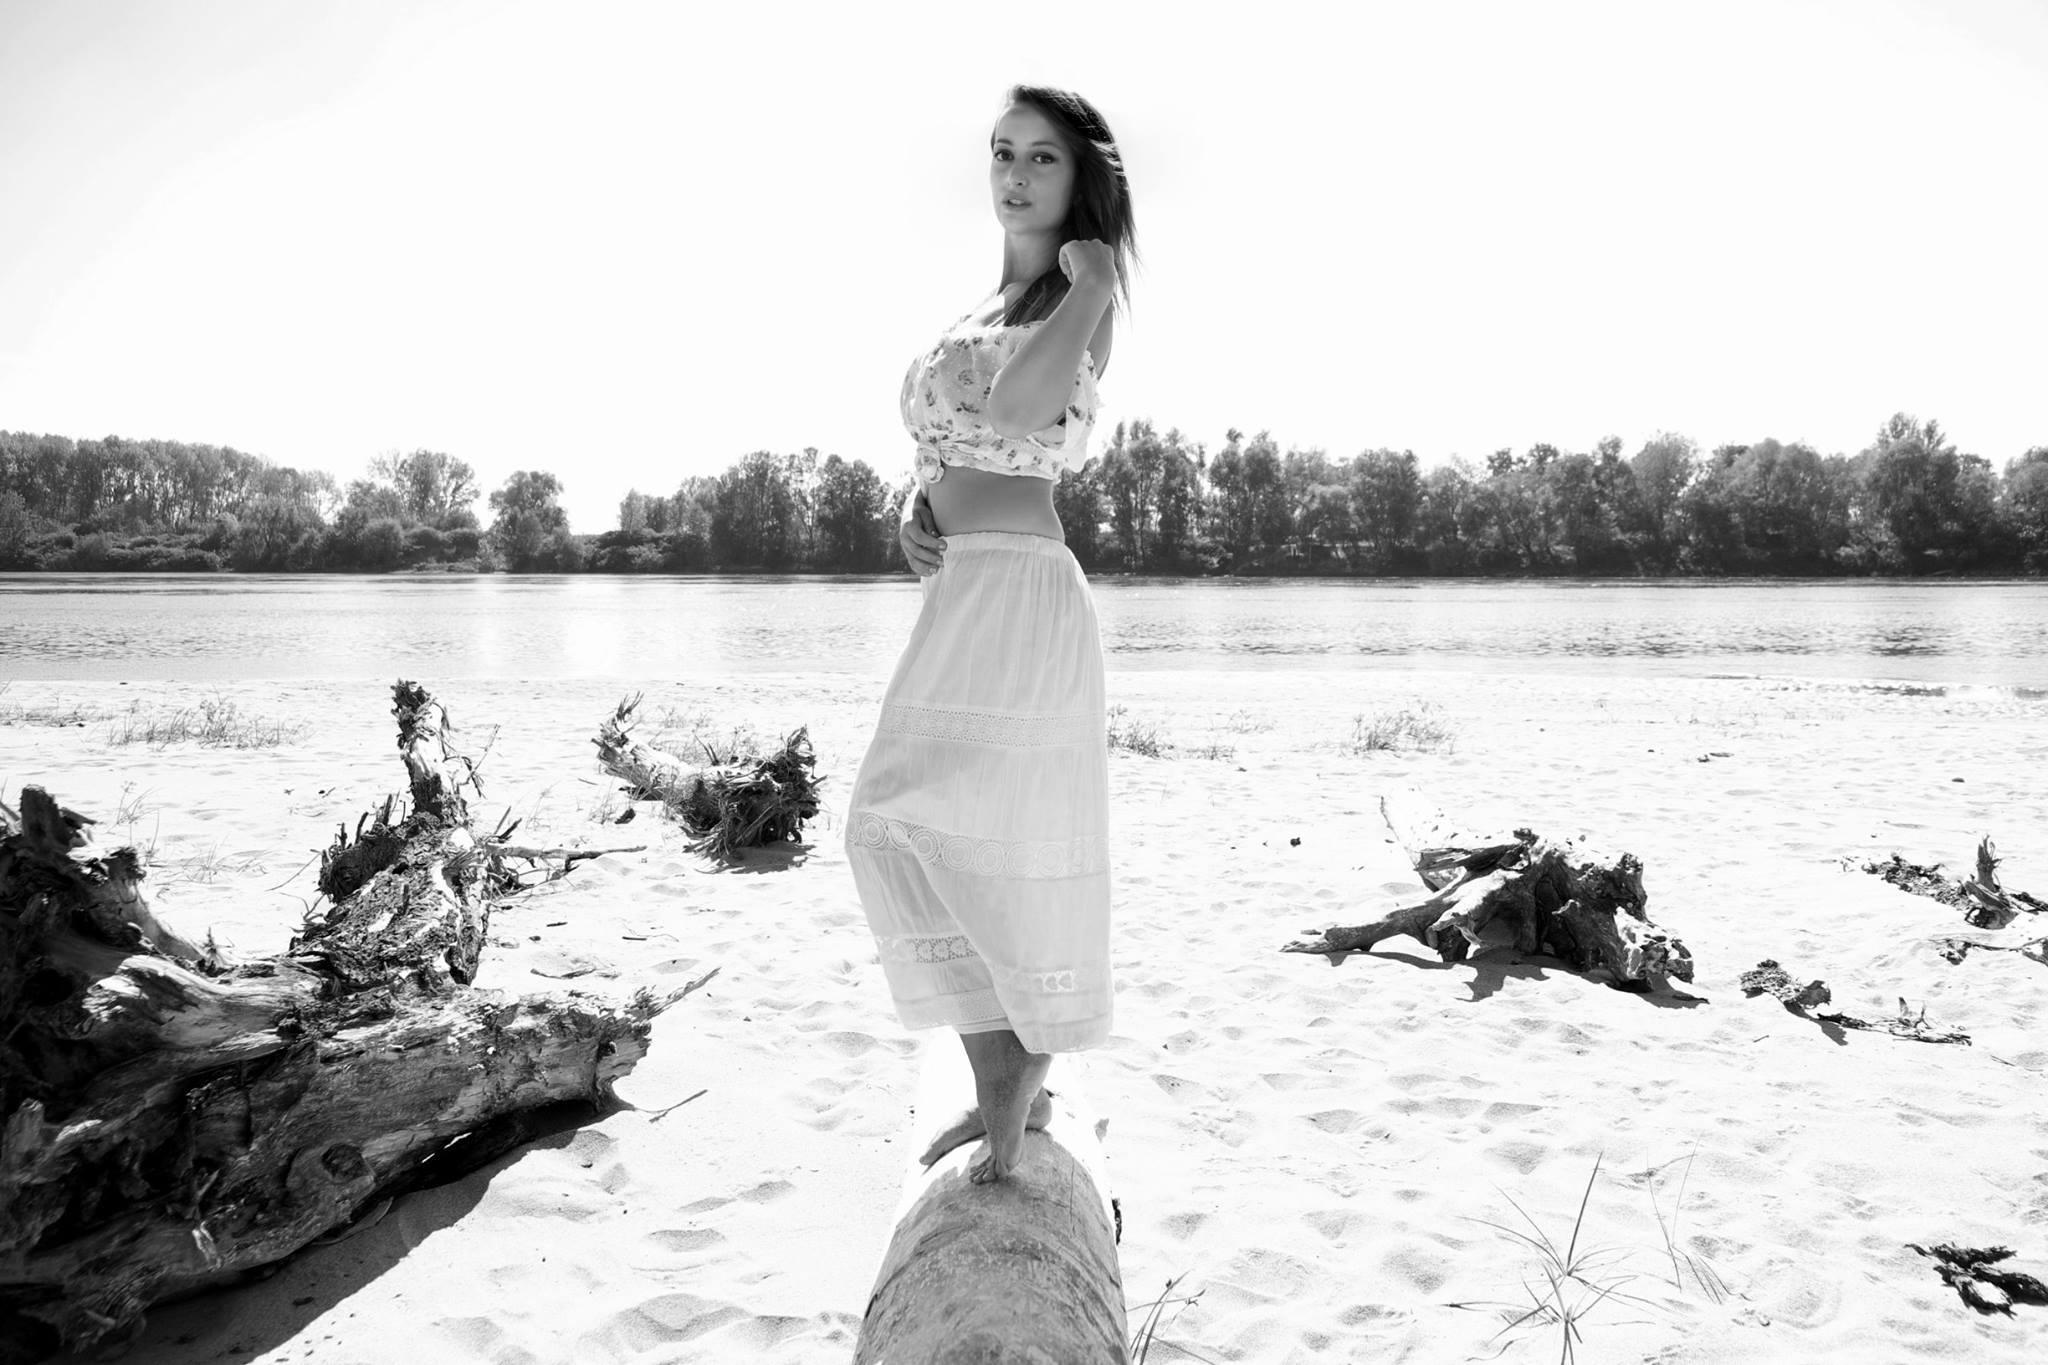 Bellezza d'arte, Lidia Laudani, la splendida modella mediterranea su Mediajob